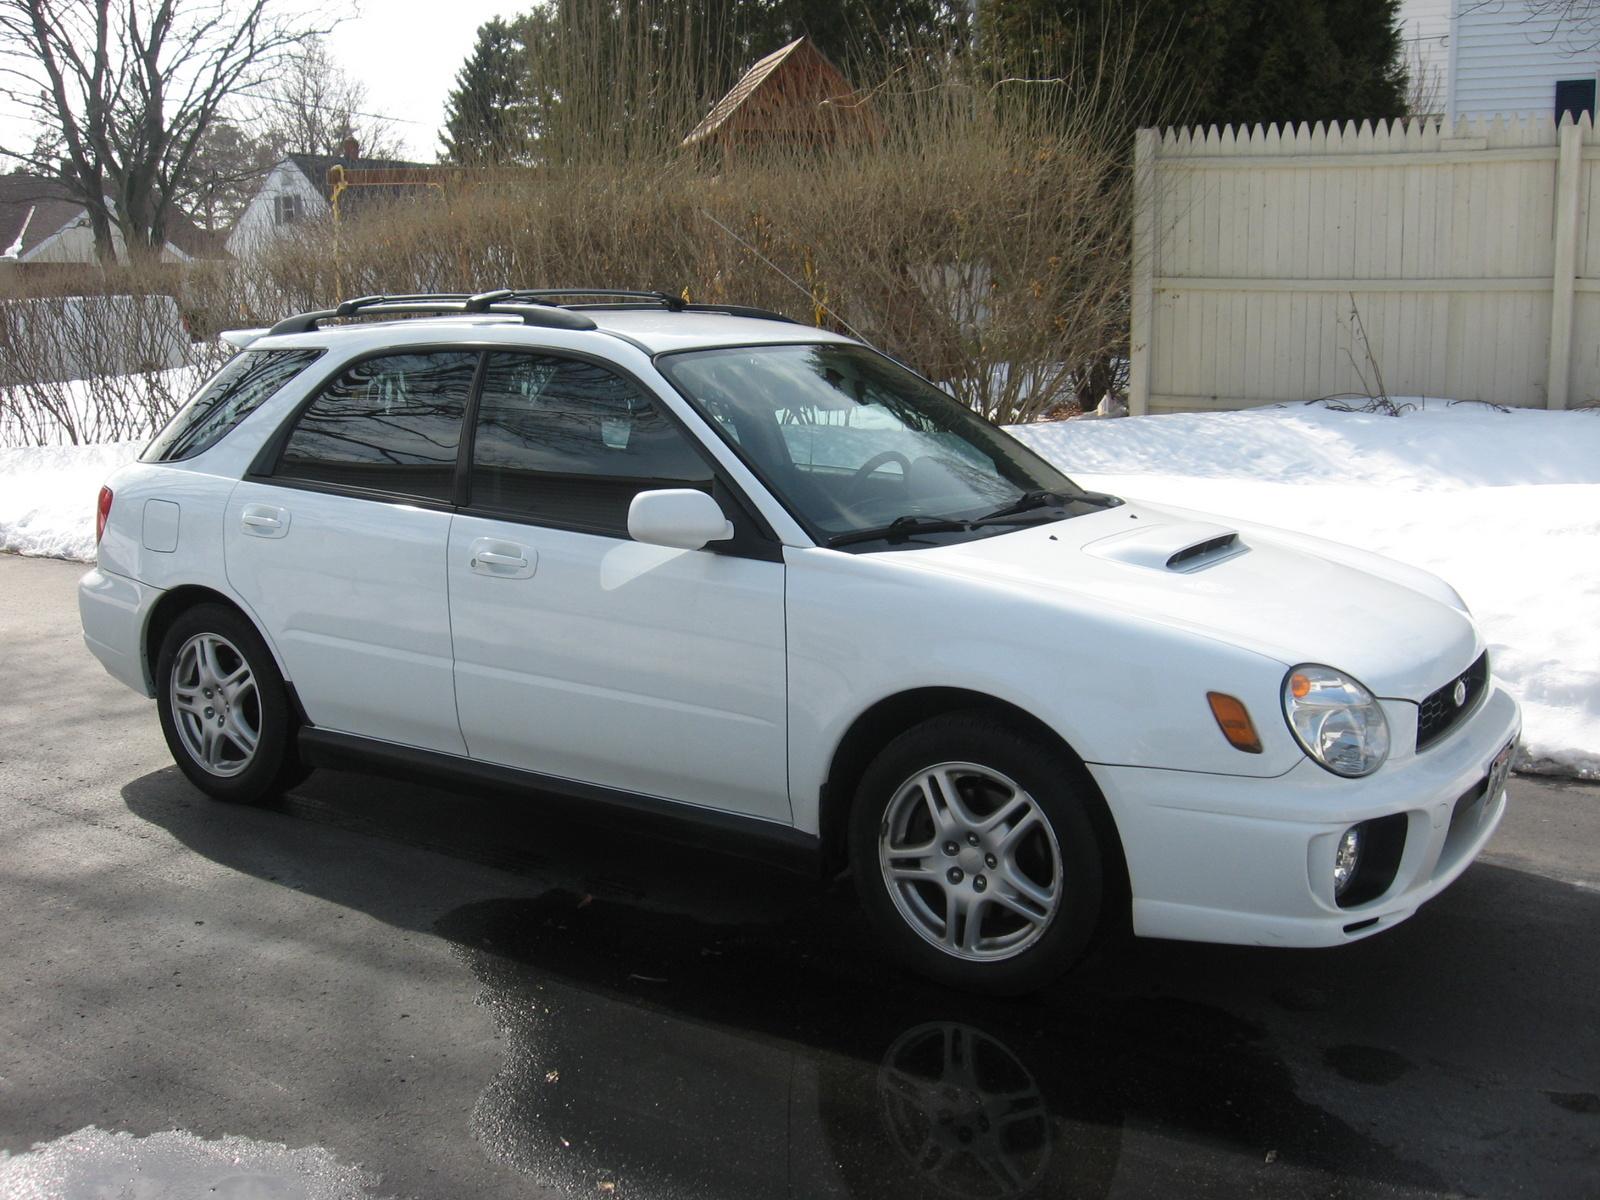 2002 Subaru Impreza Wrx Pictures Cargurus